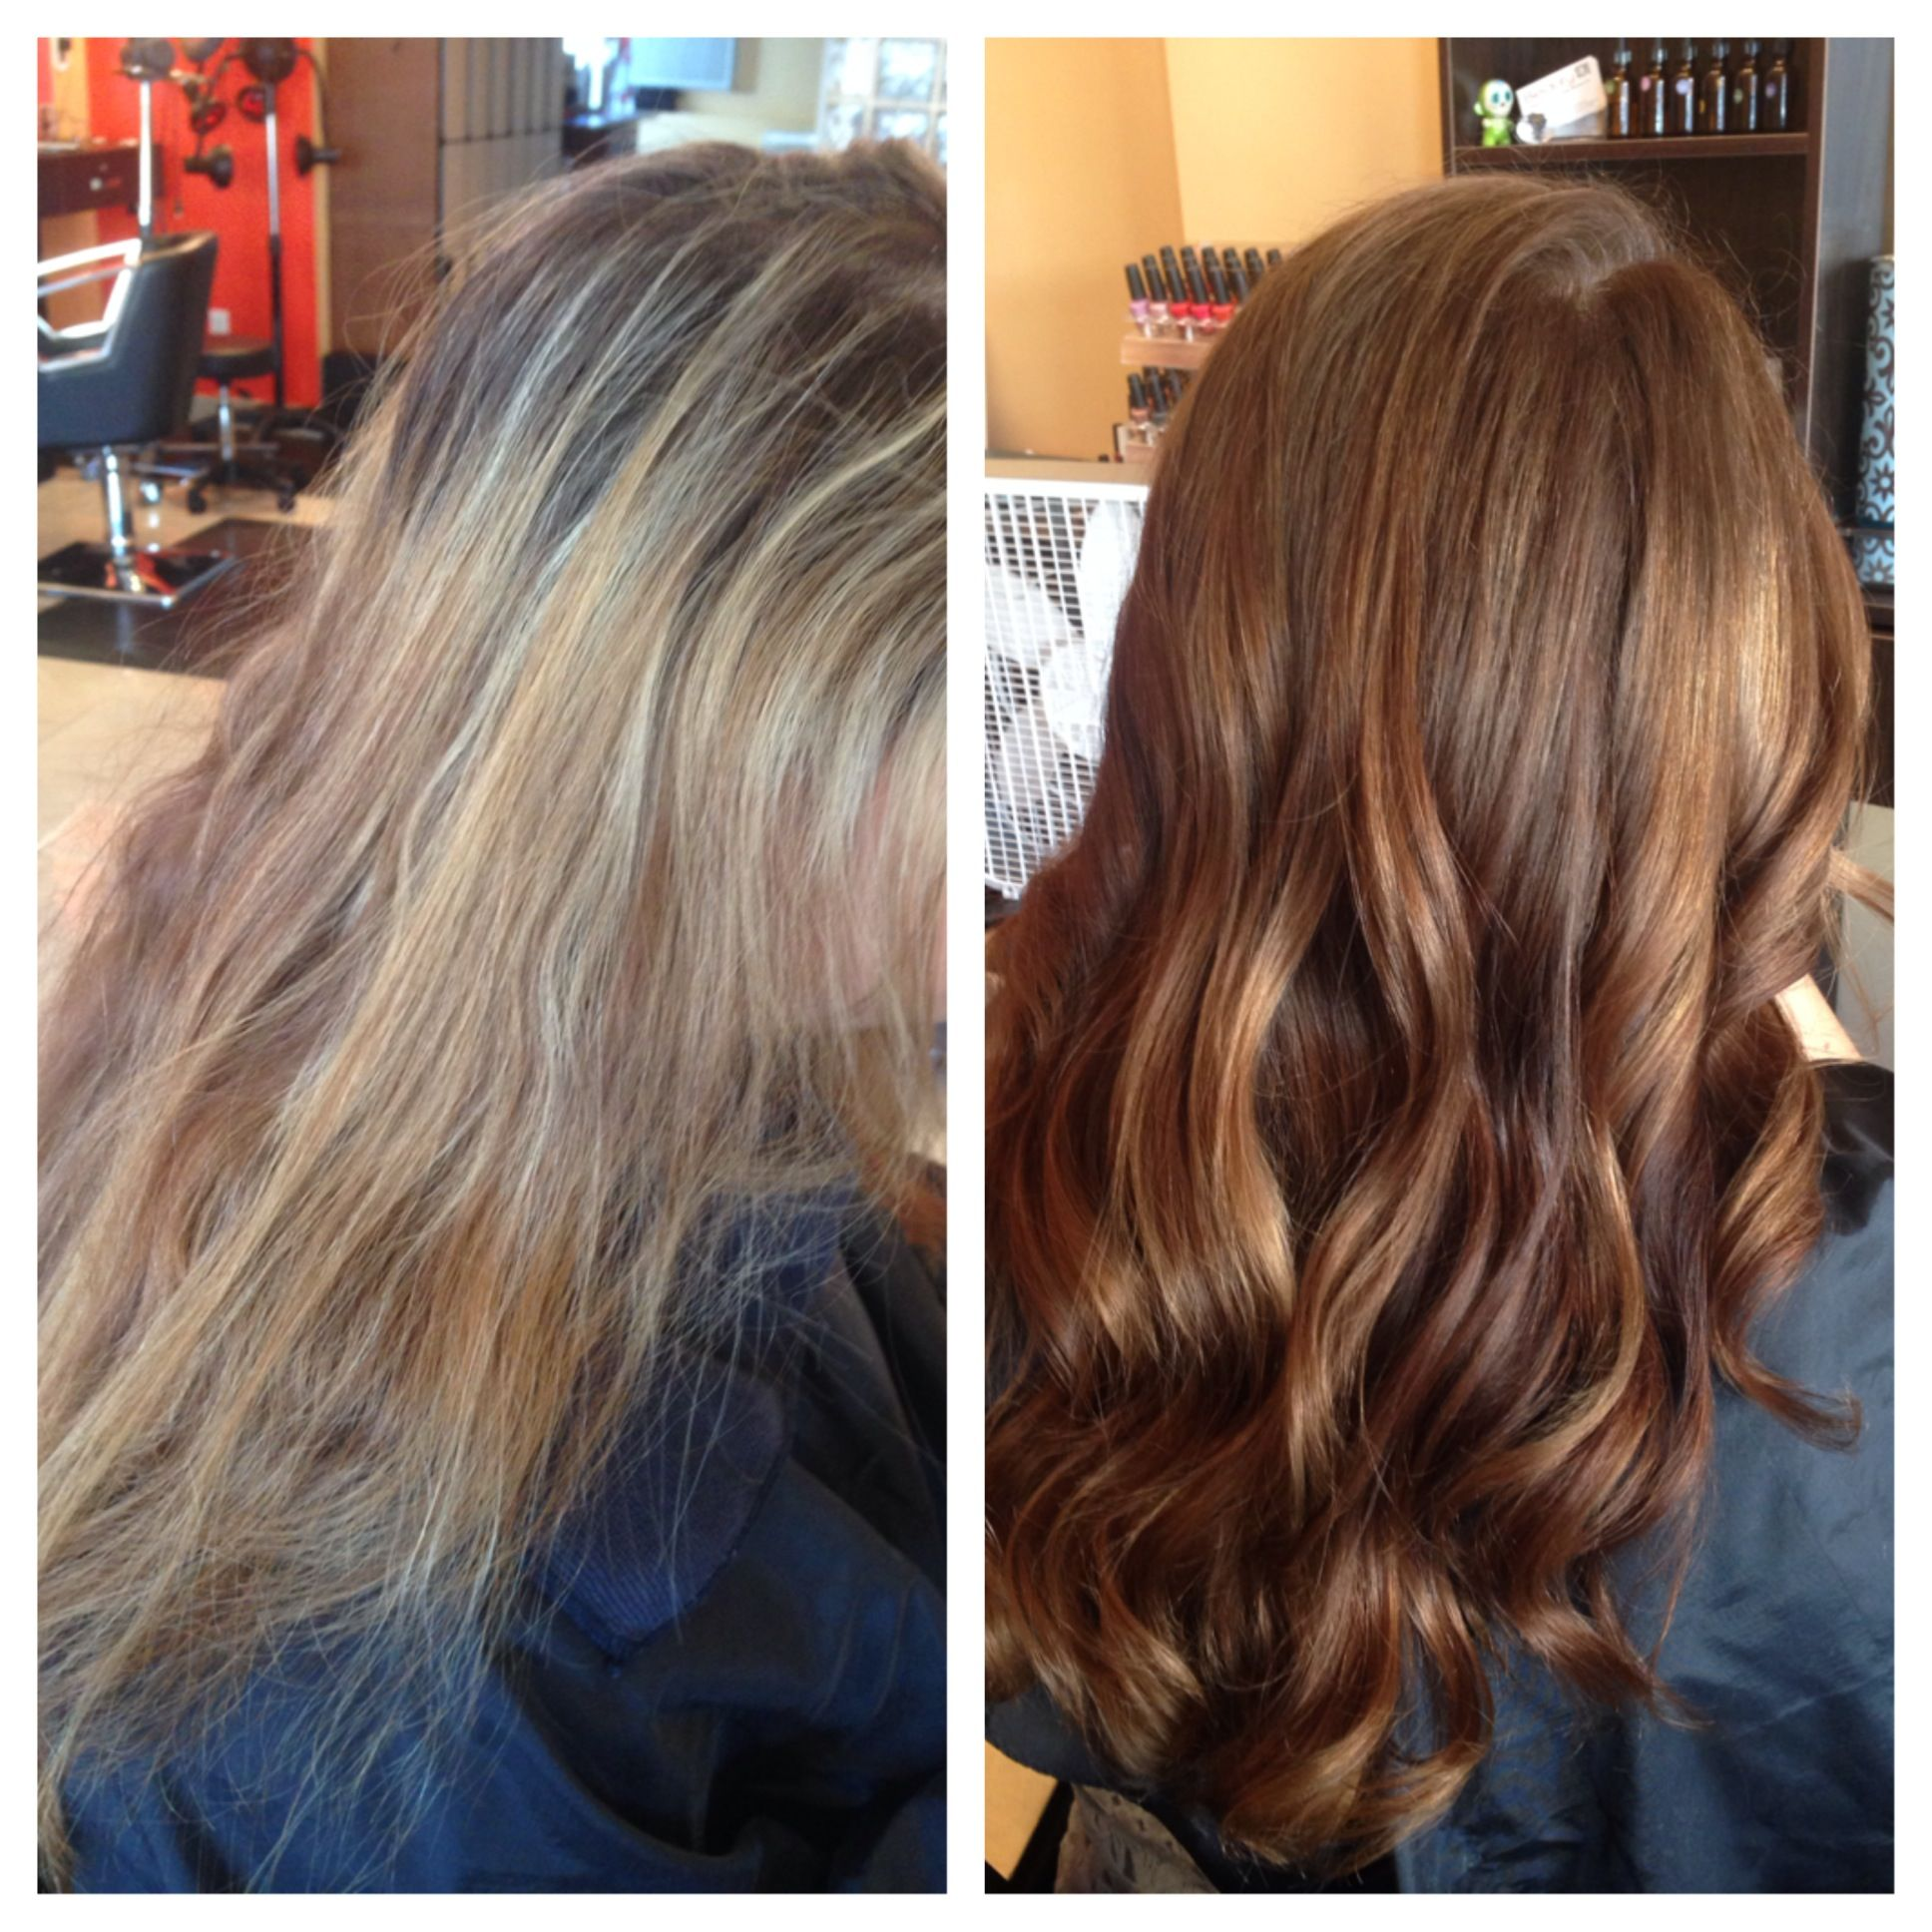 Beauty 101 Salon Oceanside Natural Hair Salons Natural Hair Styles Beauty 101